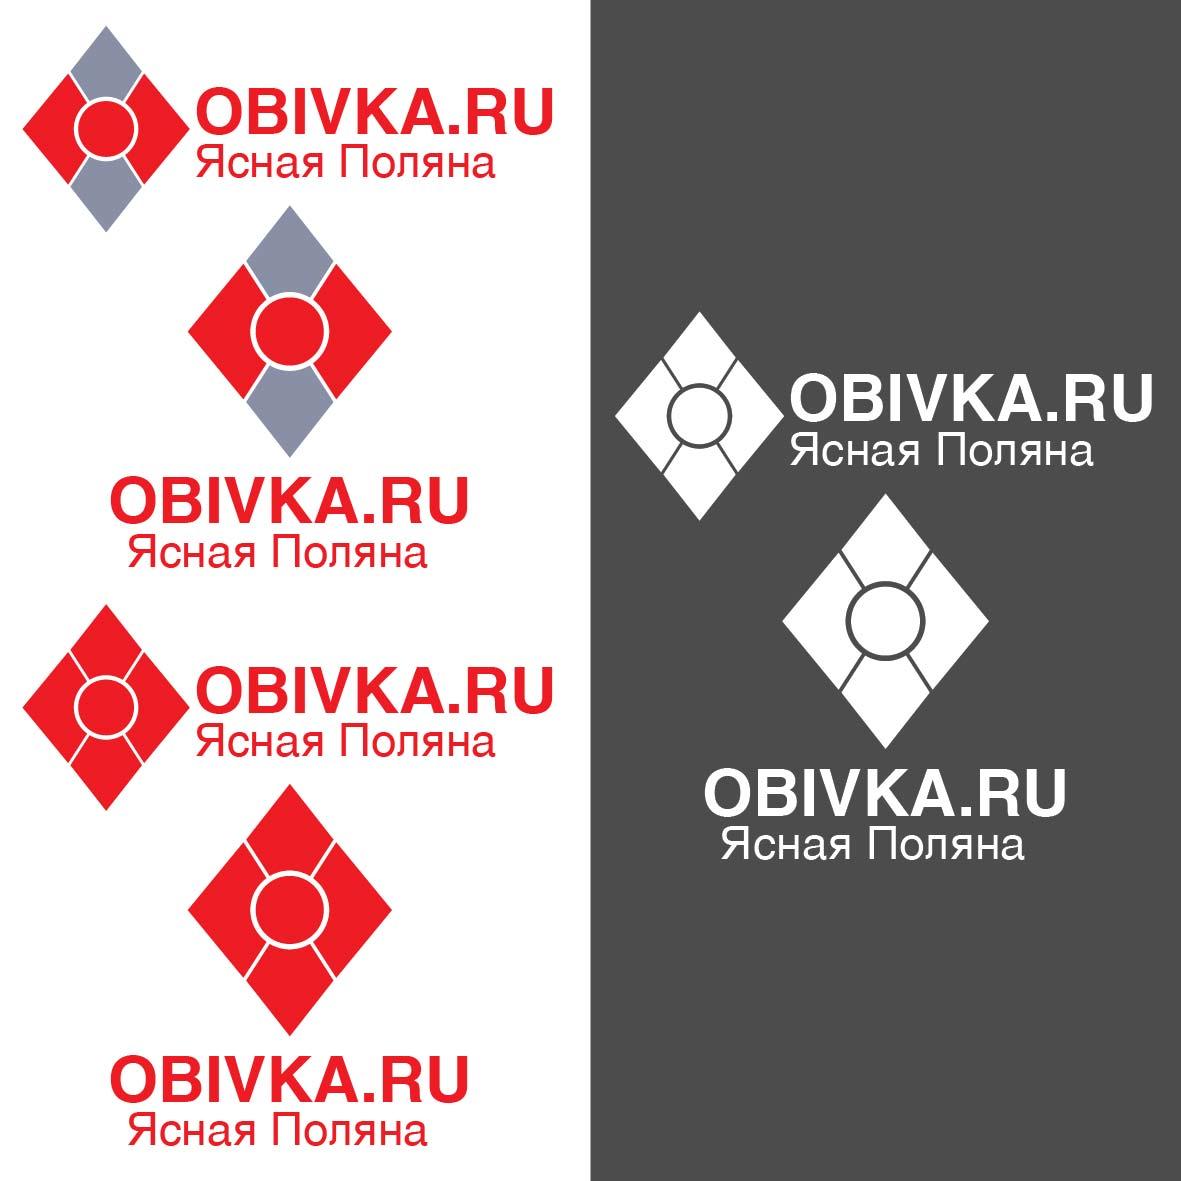 Логотип для сайта OBIVKA.RU фото f_4875c10fdbc205f8.jpg